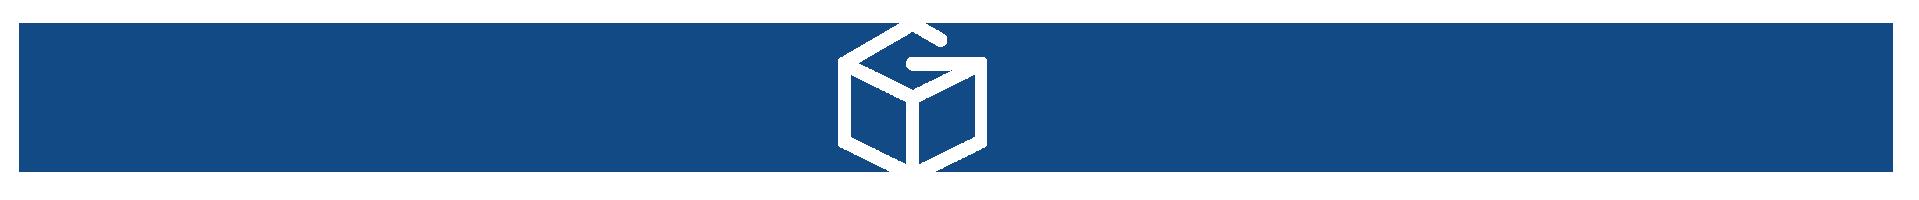 GlassBoxGroup-full-logo-mix2